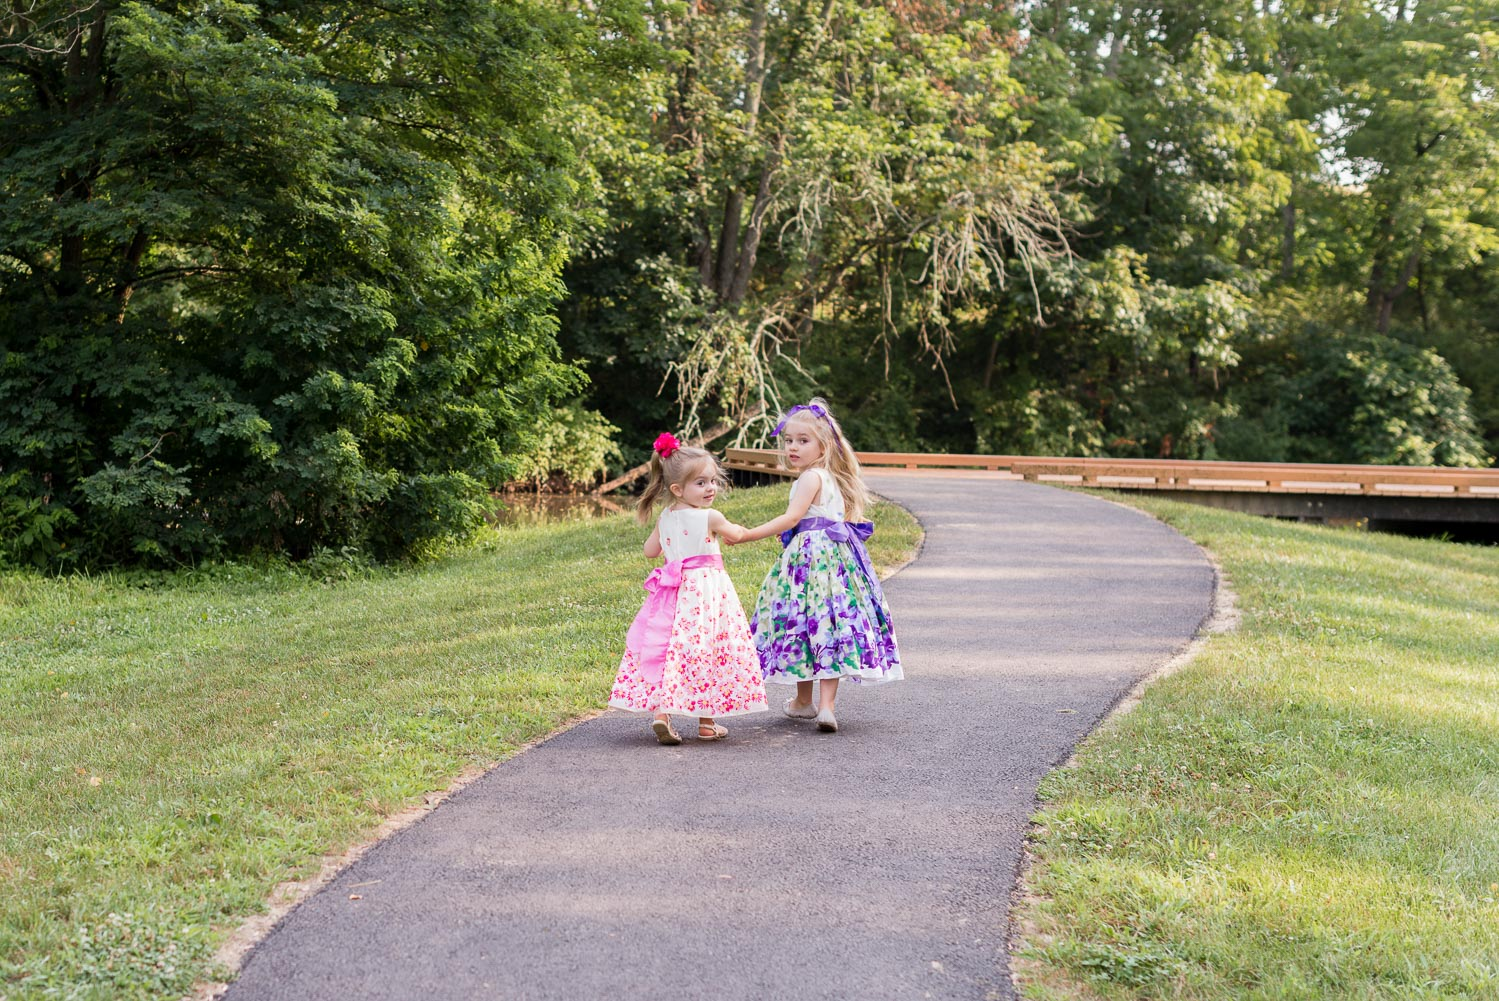 fischer park montgomery county photographer girls walking